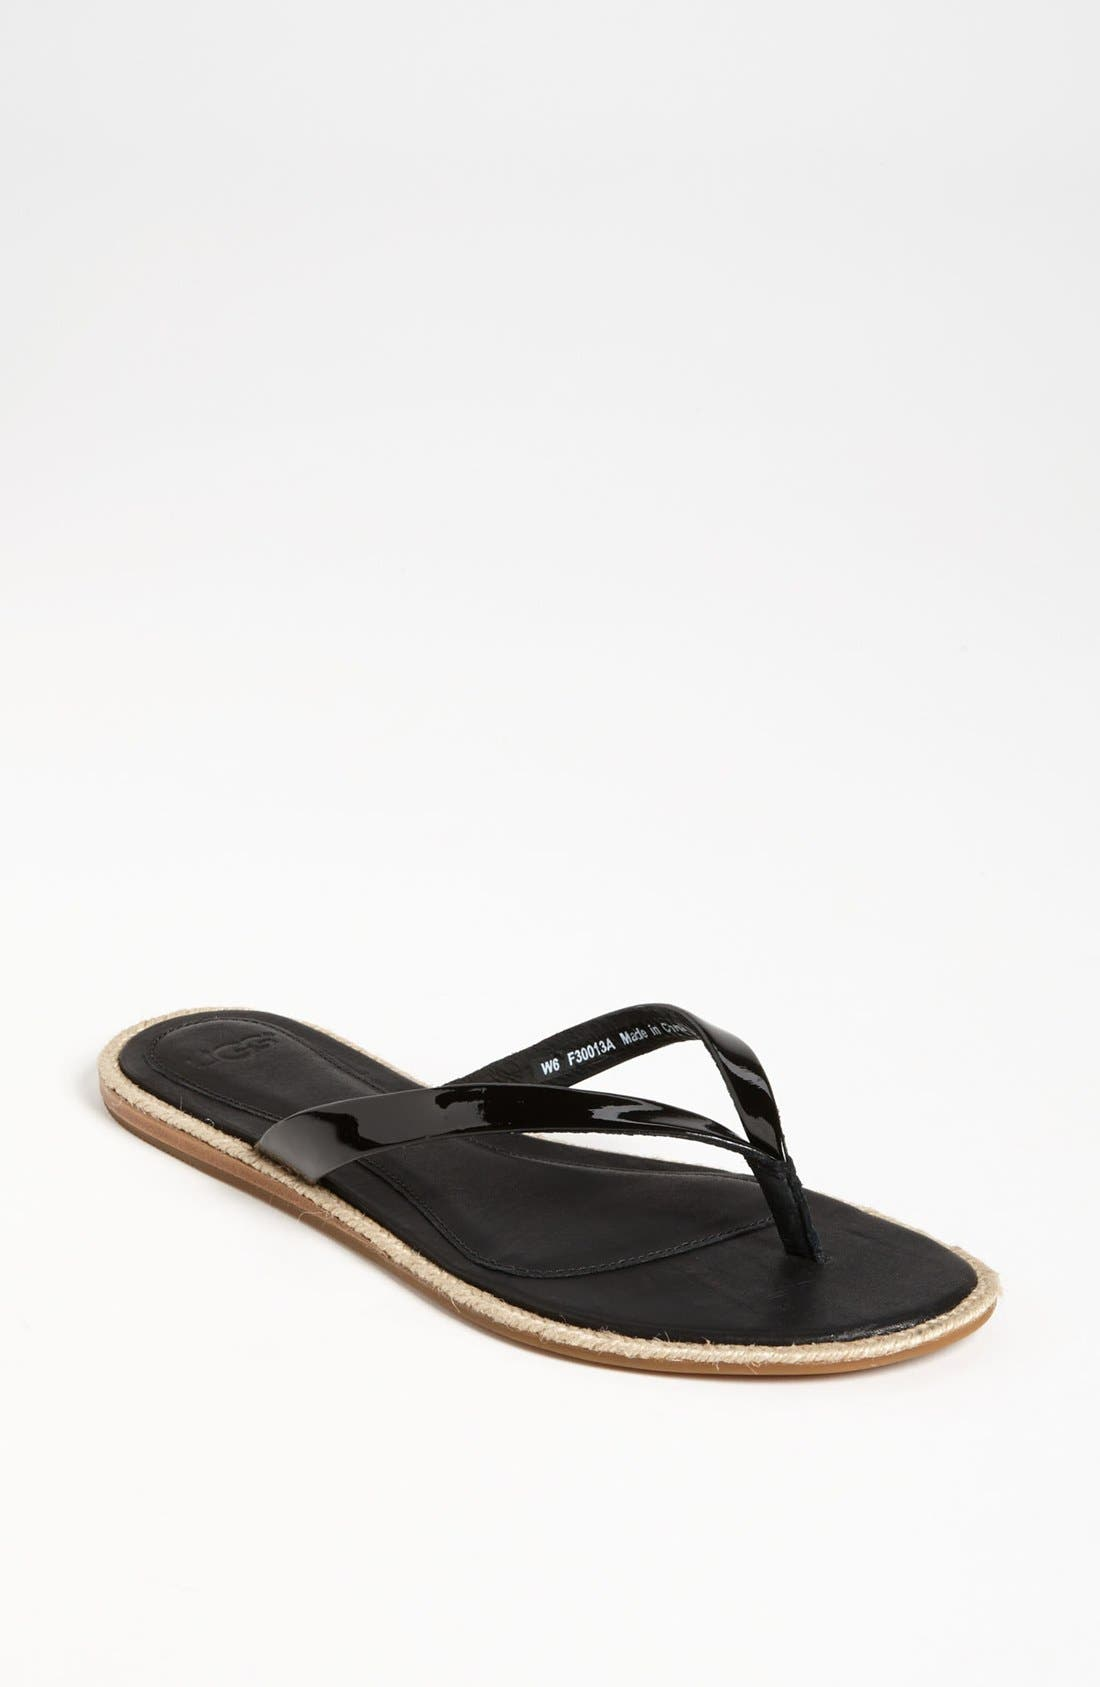 Alternate Image 1 Selected - UGG® Australia 'Allaria' Flip Flop (Women)